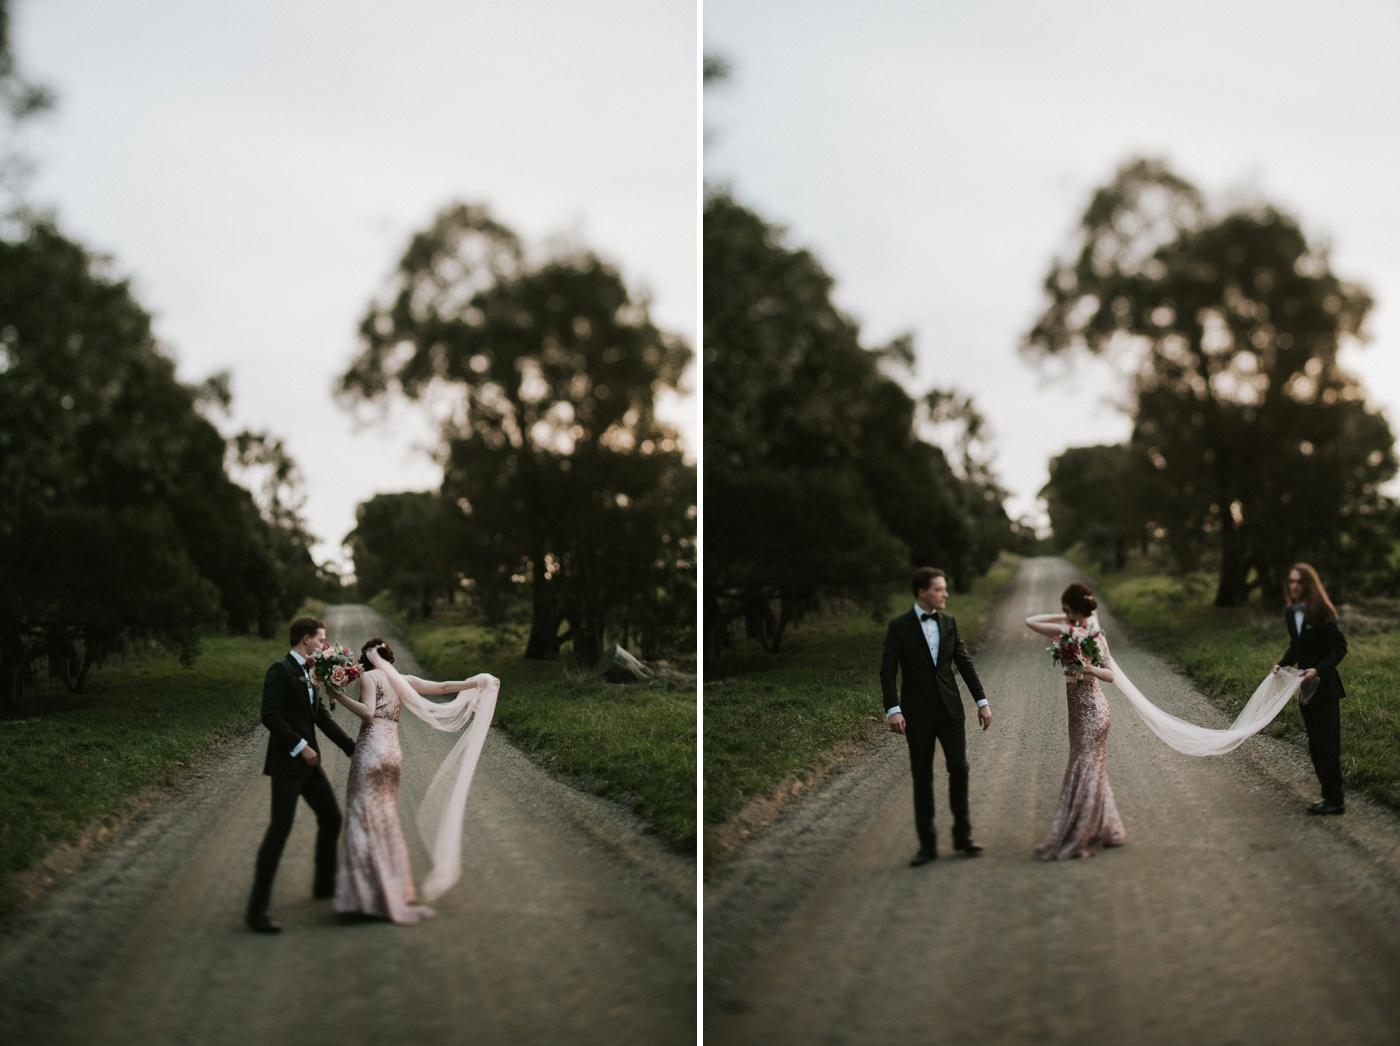 Emma&Morgan_Melbourne-Vintage-Elegant-Fun-Quirky-Yarra-Valley-Vineyard-Wedding_Melbourne-Wedding-Photography-71